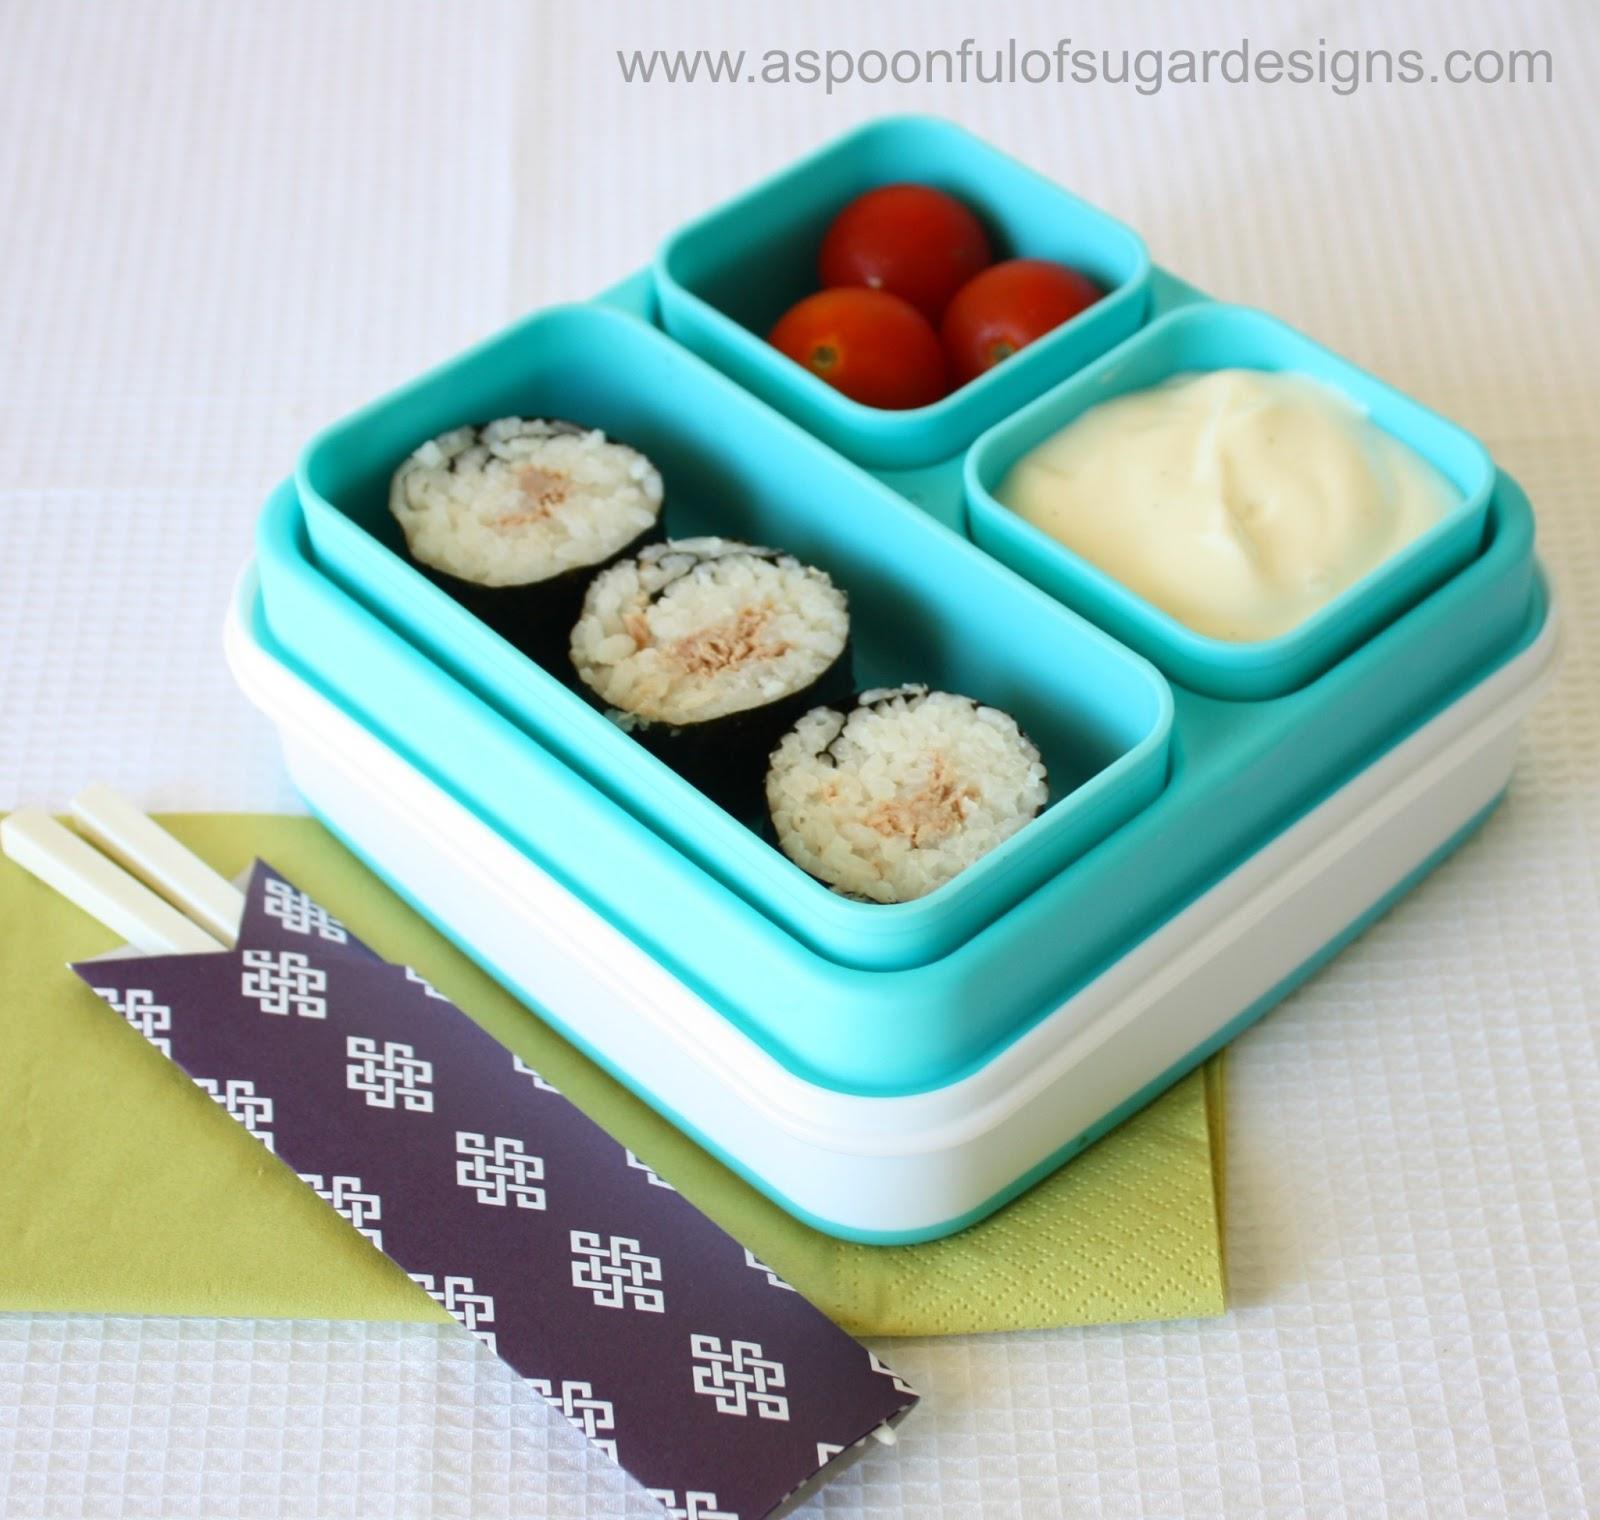 Lunch Box Ideas - A Spoonful of Sugar - photo#44